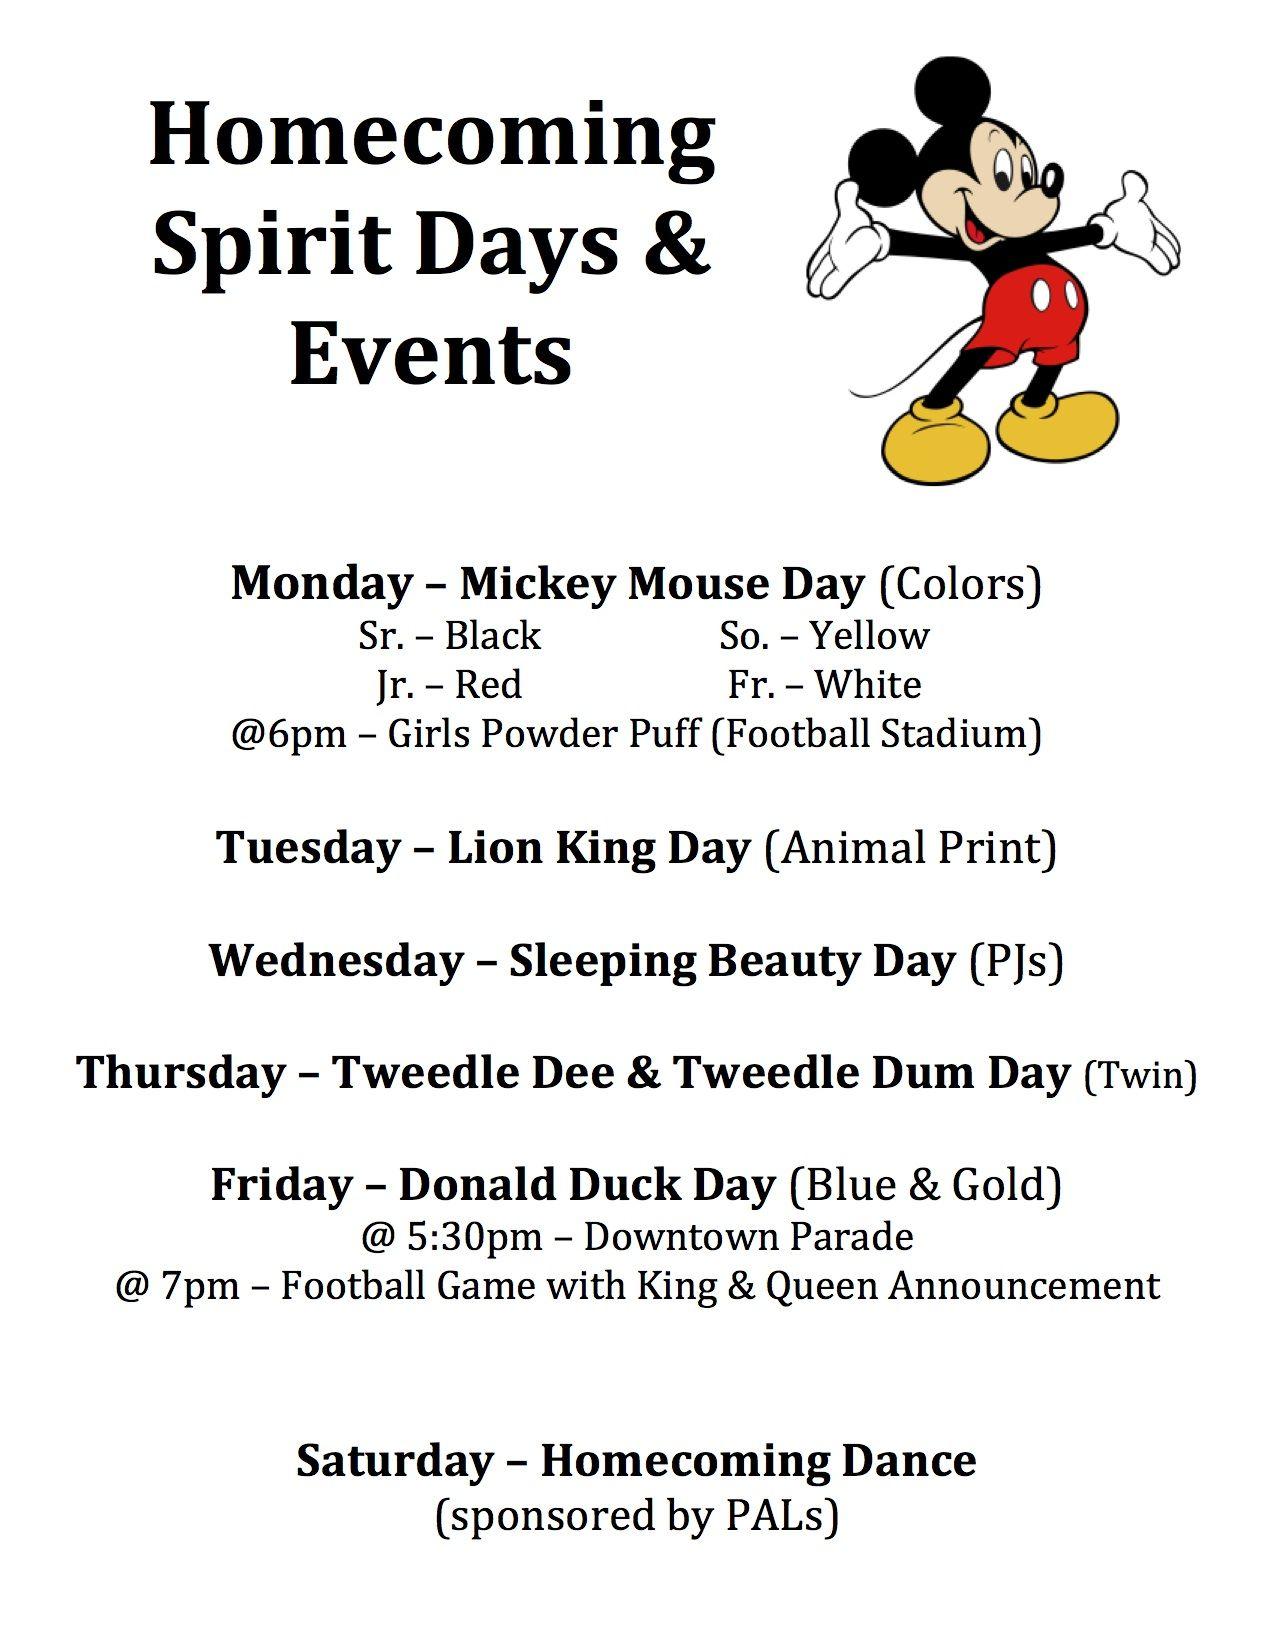 Unique ideas for spirit week - Homecoming Spirit Days